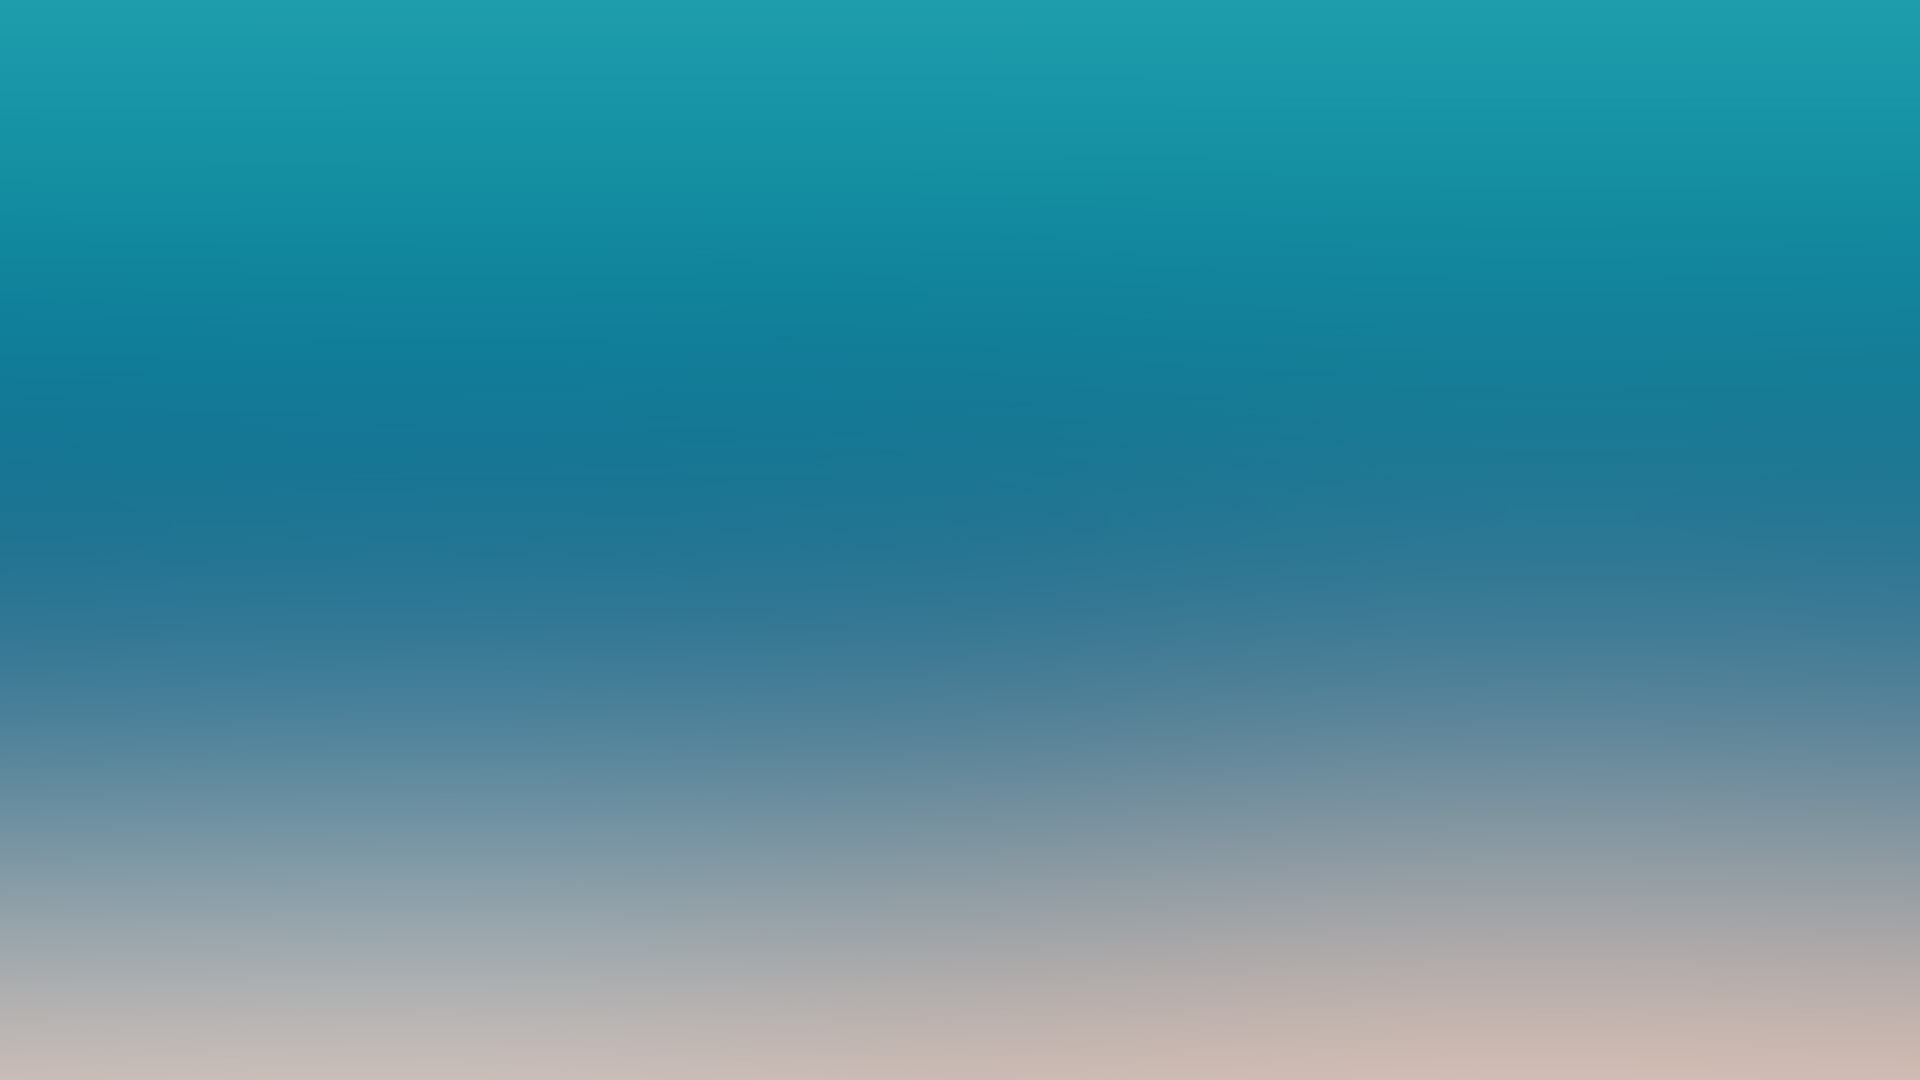 Sj11 Blue Top Soft Pastel Blur Wallpaper